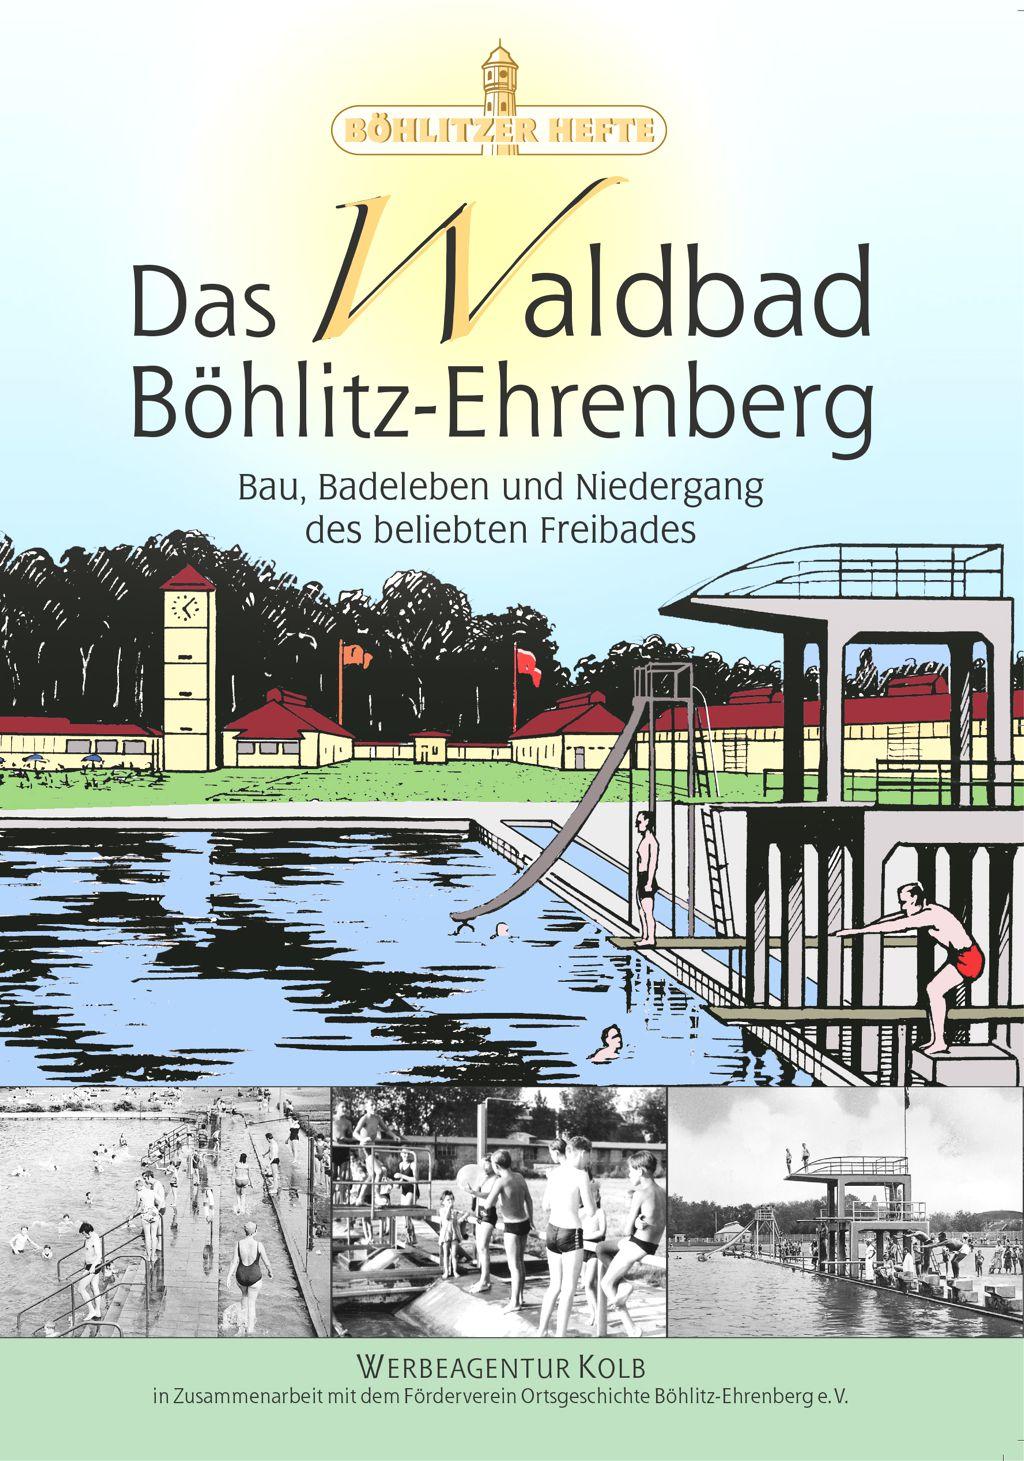 03-waldbad-be